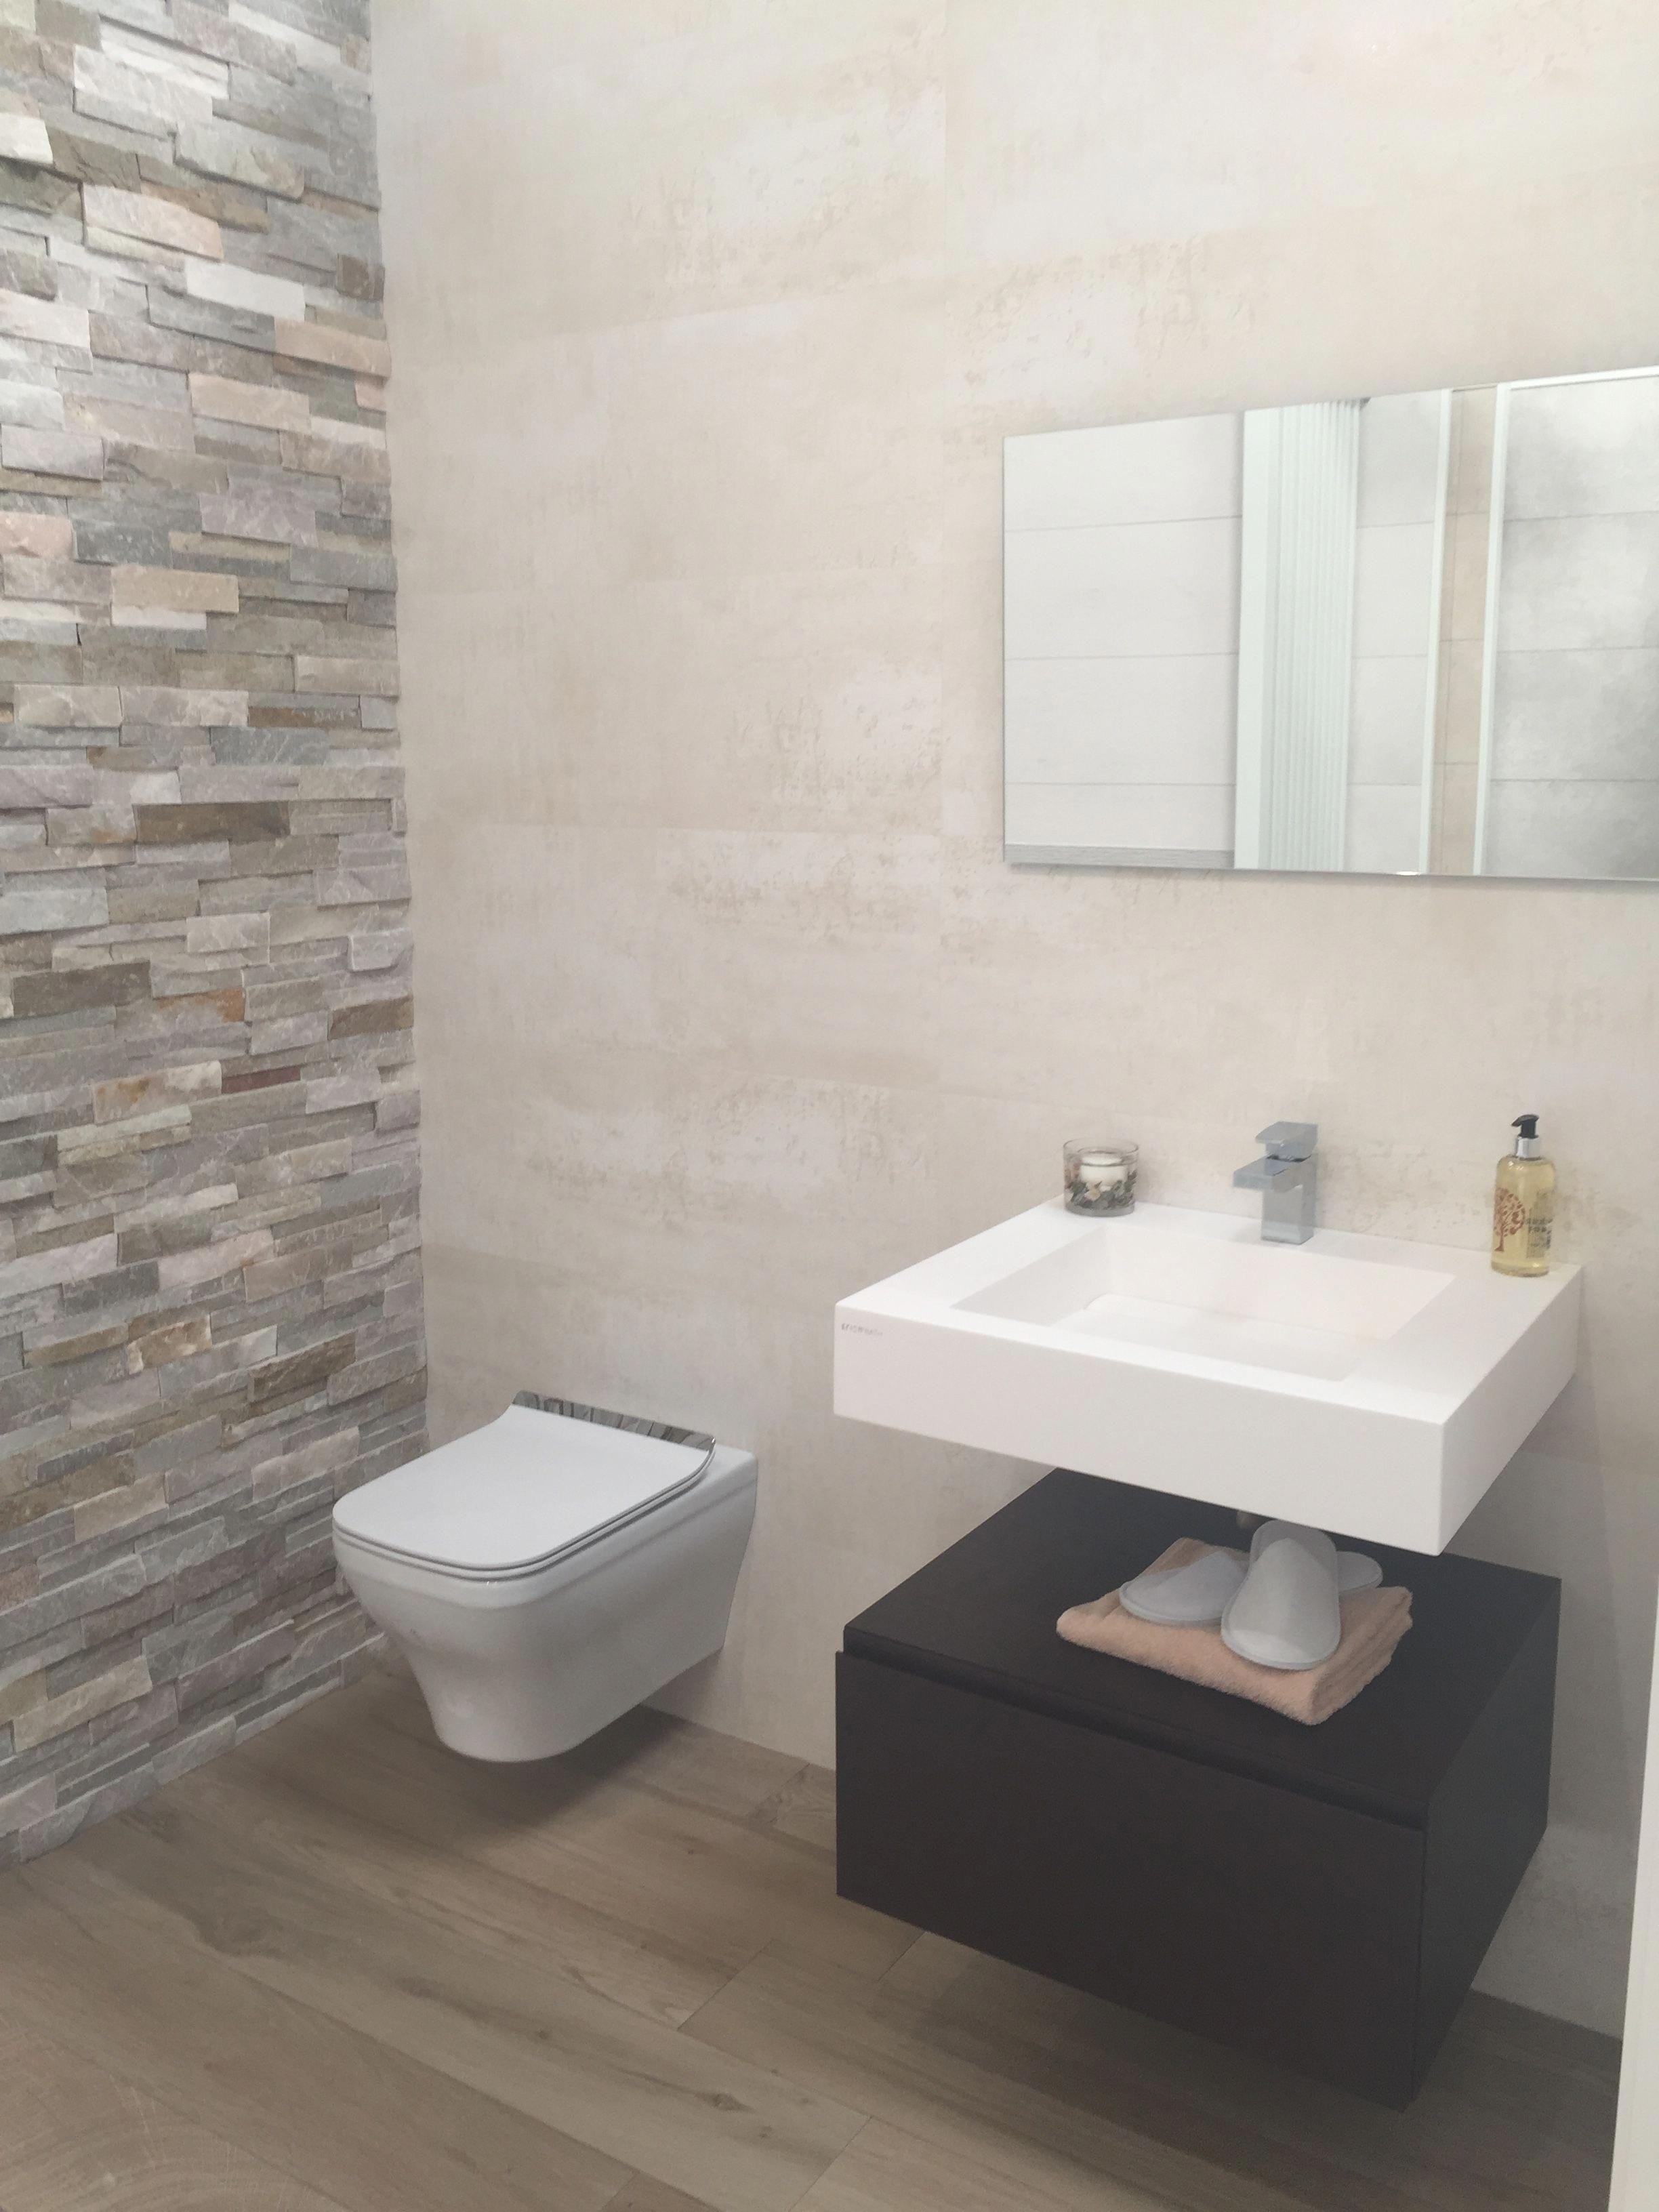 Porcelanosa Wall Tile Laja Blanco Contemporary Bathroom Designs Bathroom Design Modern Bathroom Tile